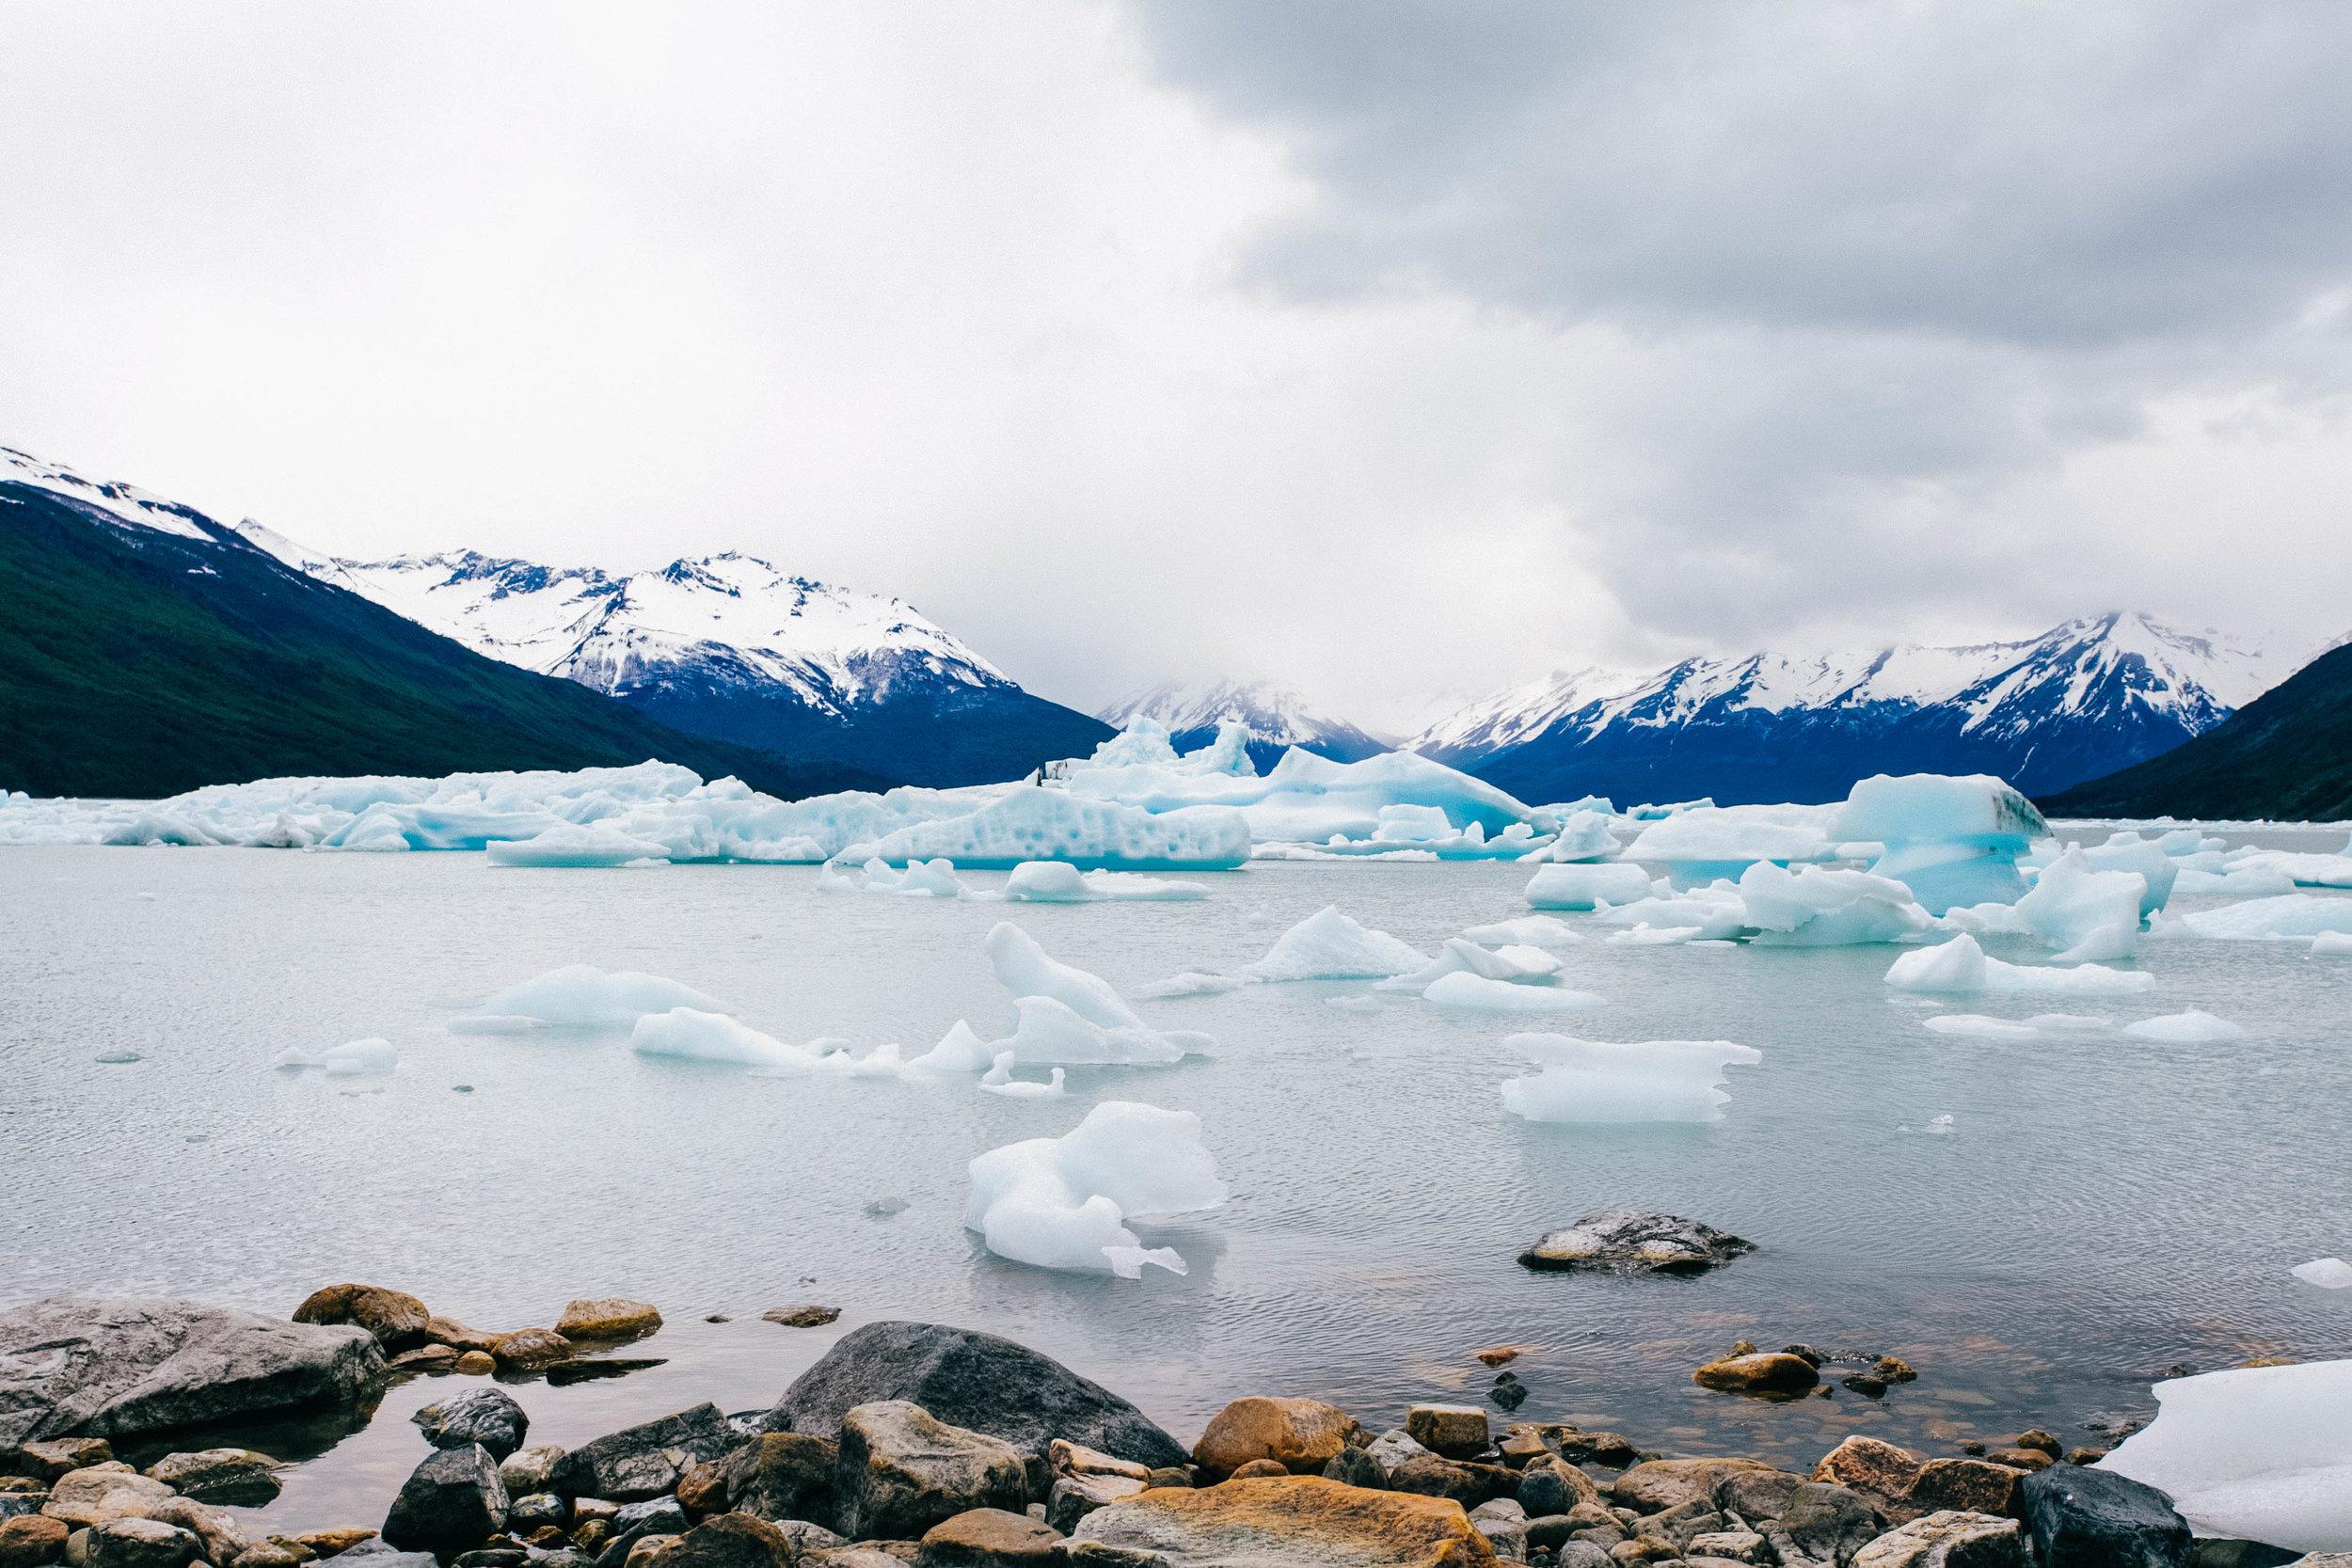 perito moreno patagonia argentina 25.jpg